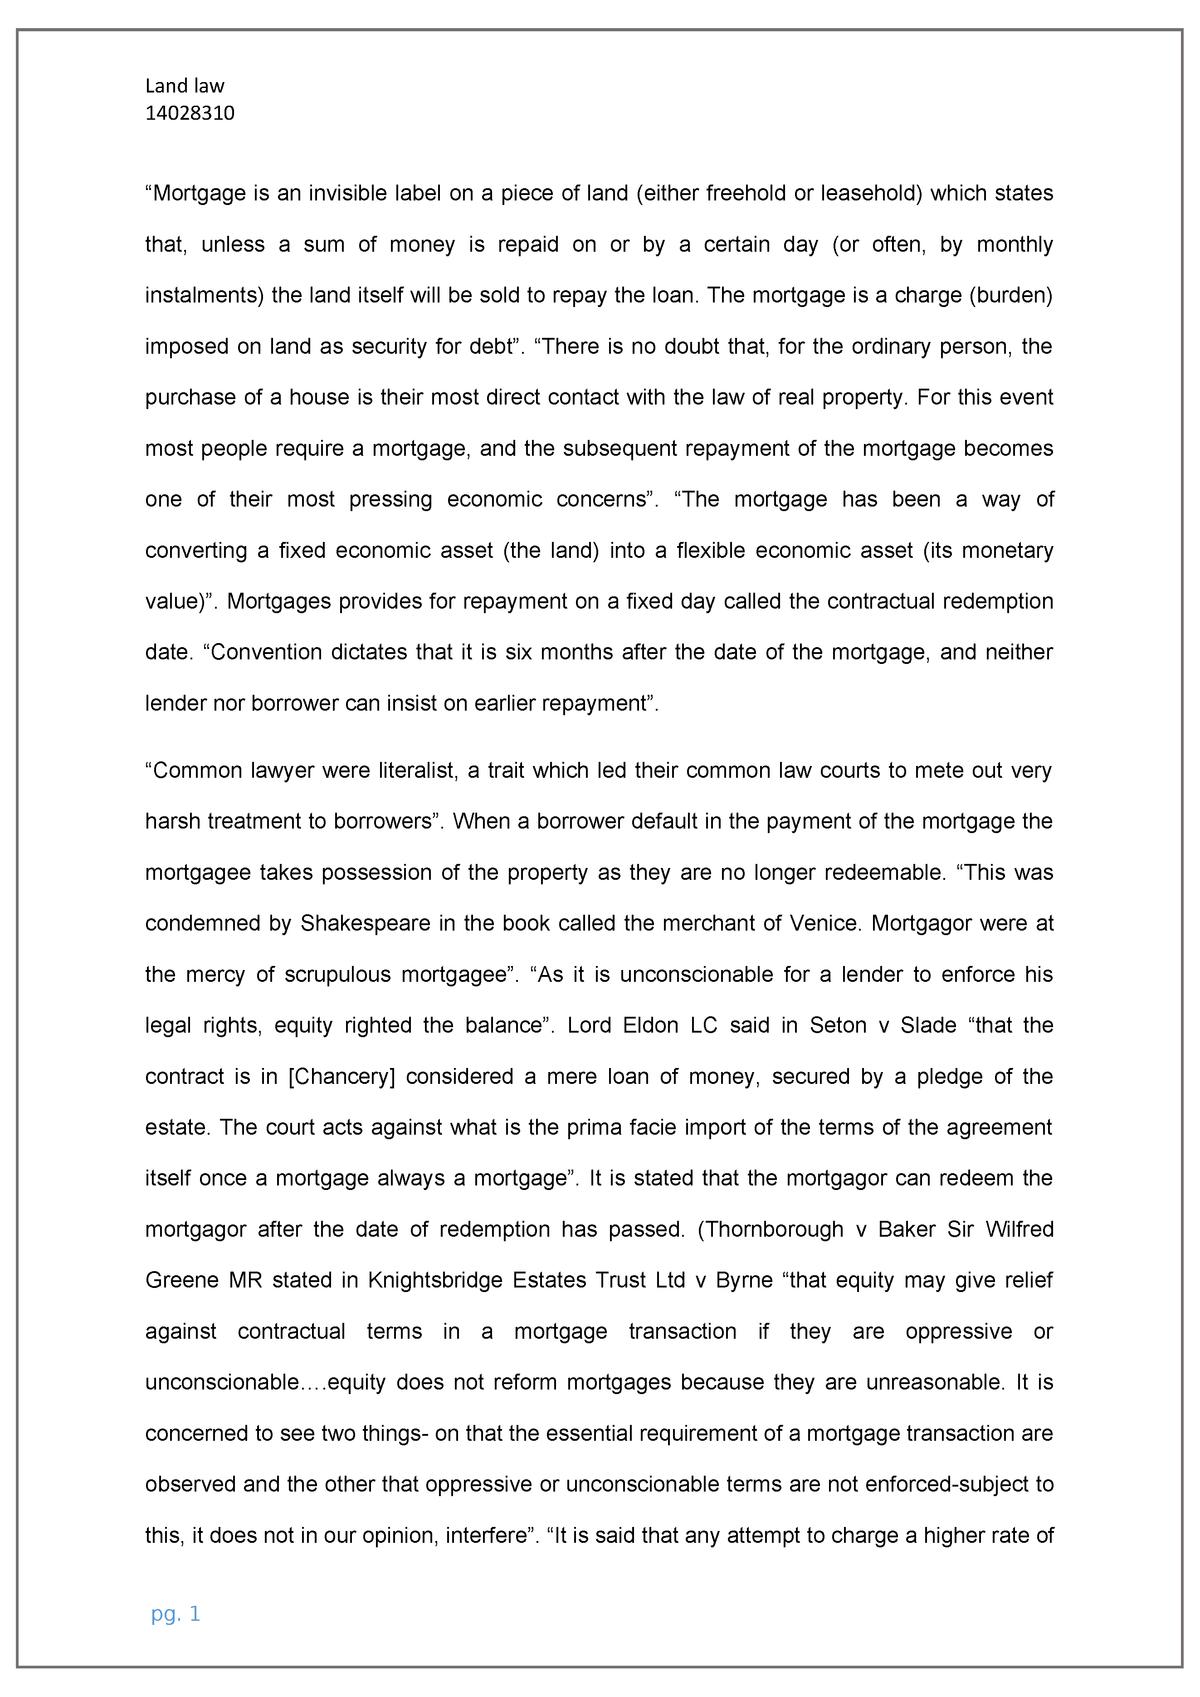 Land law essays